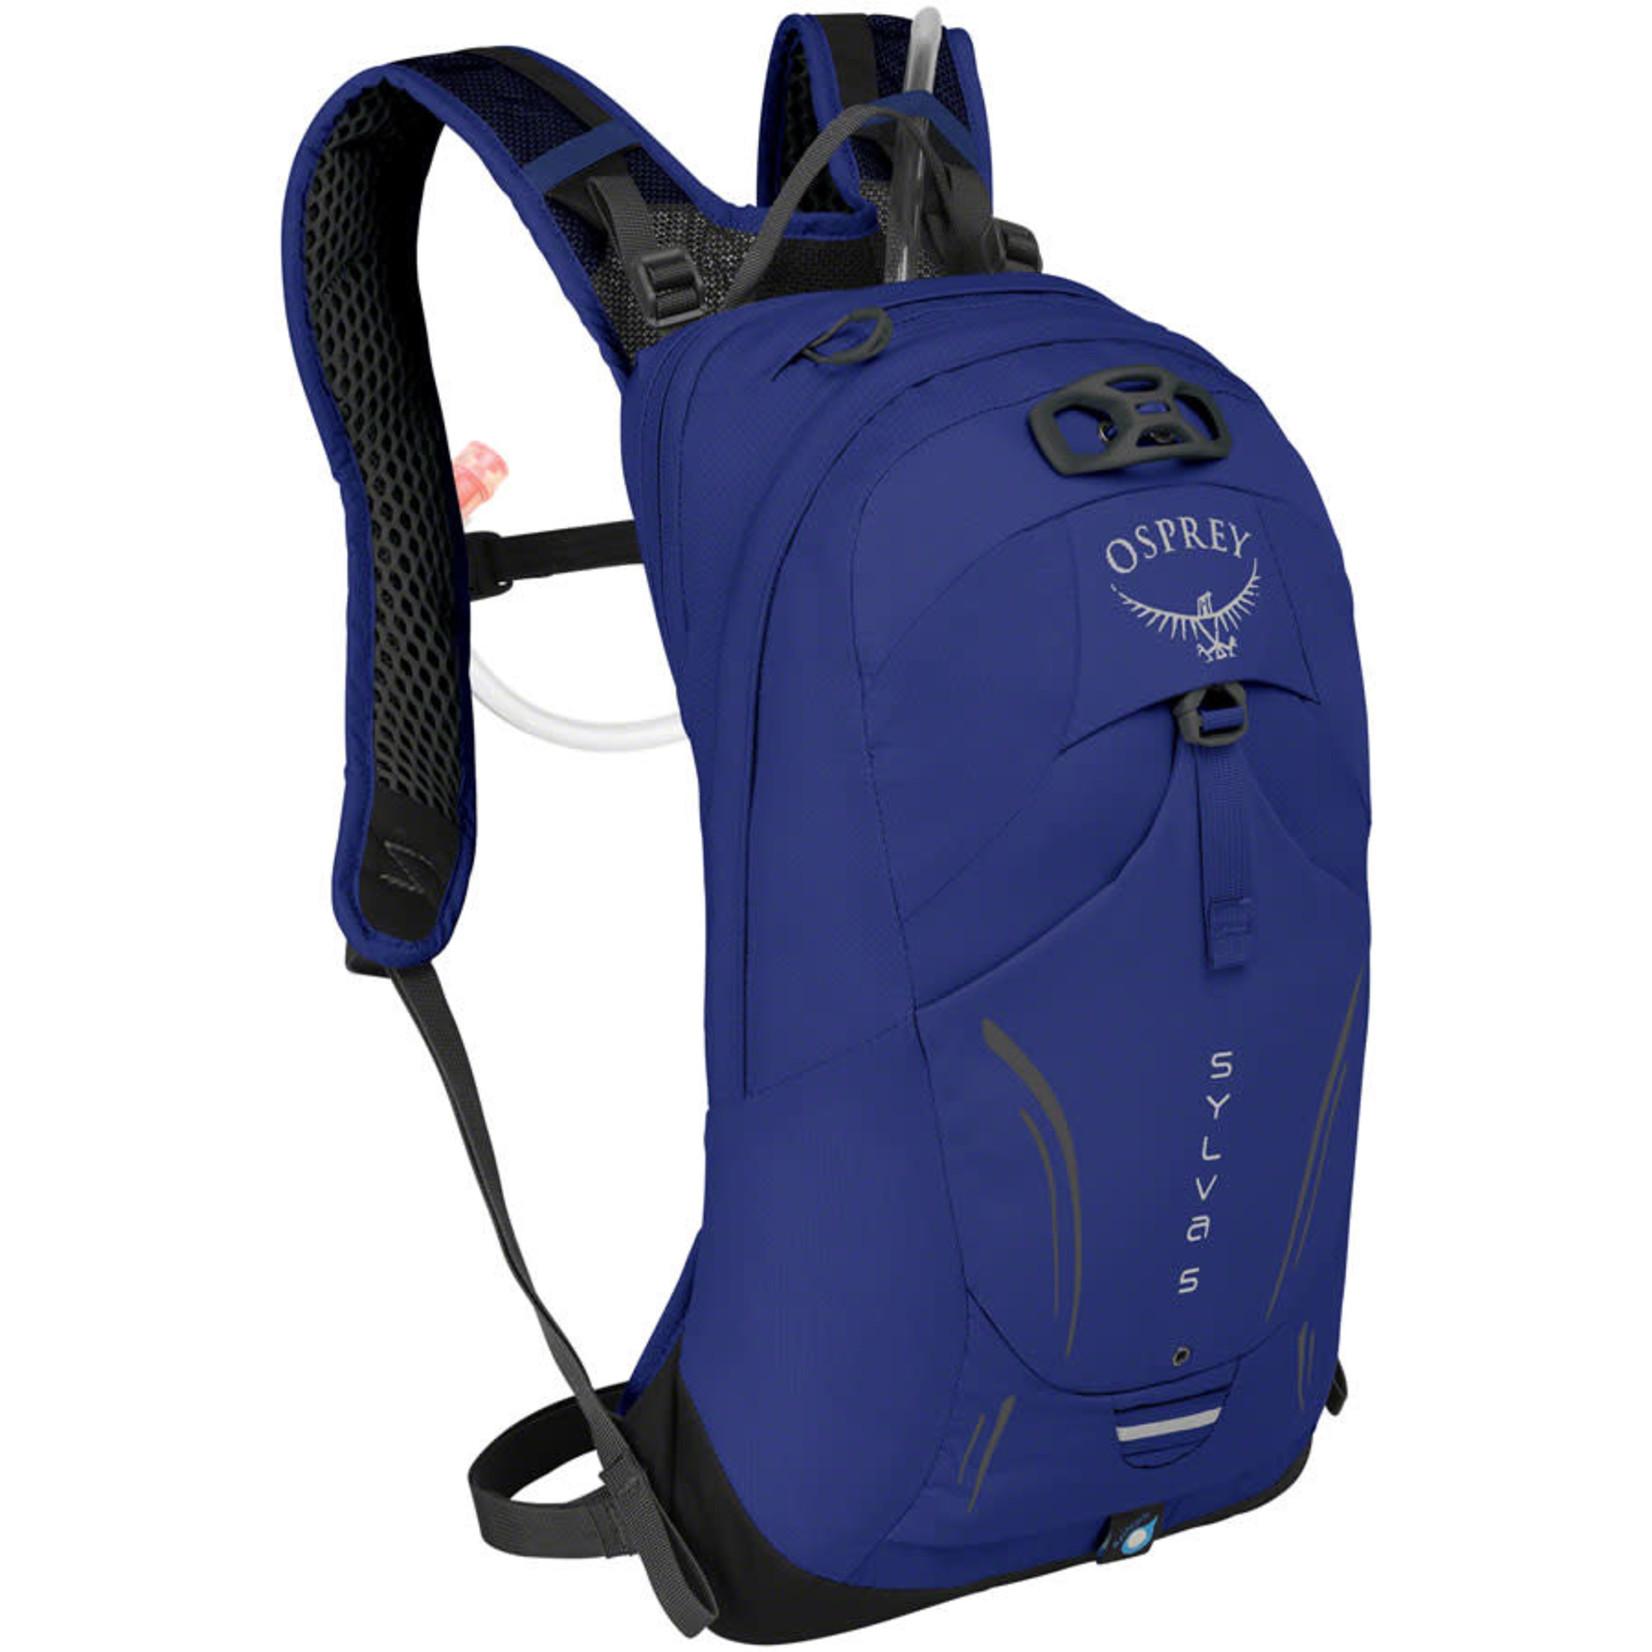 Osprey Sylva 5 Women's Hydration Pack: - Zodiac Purple